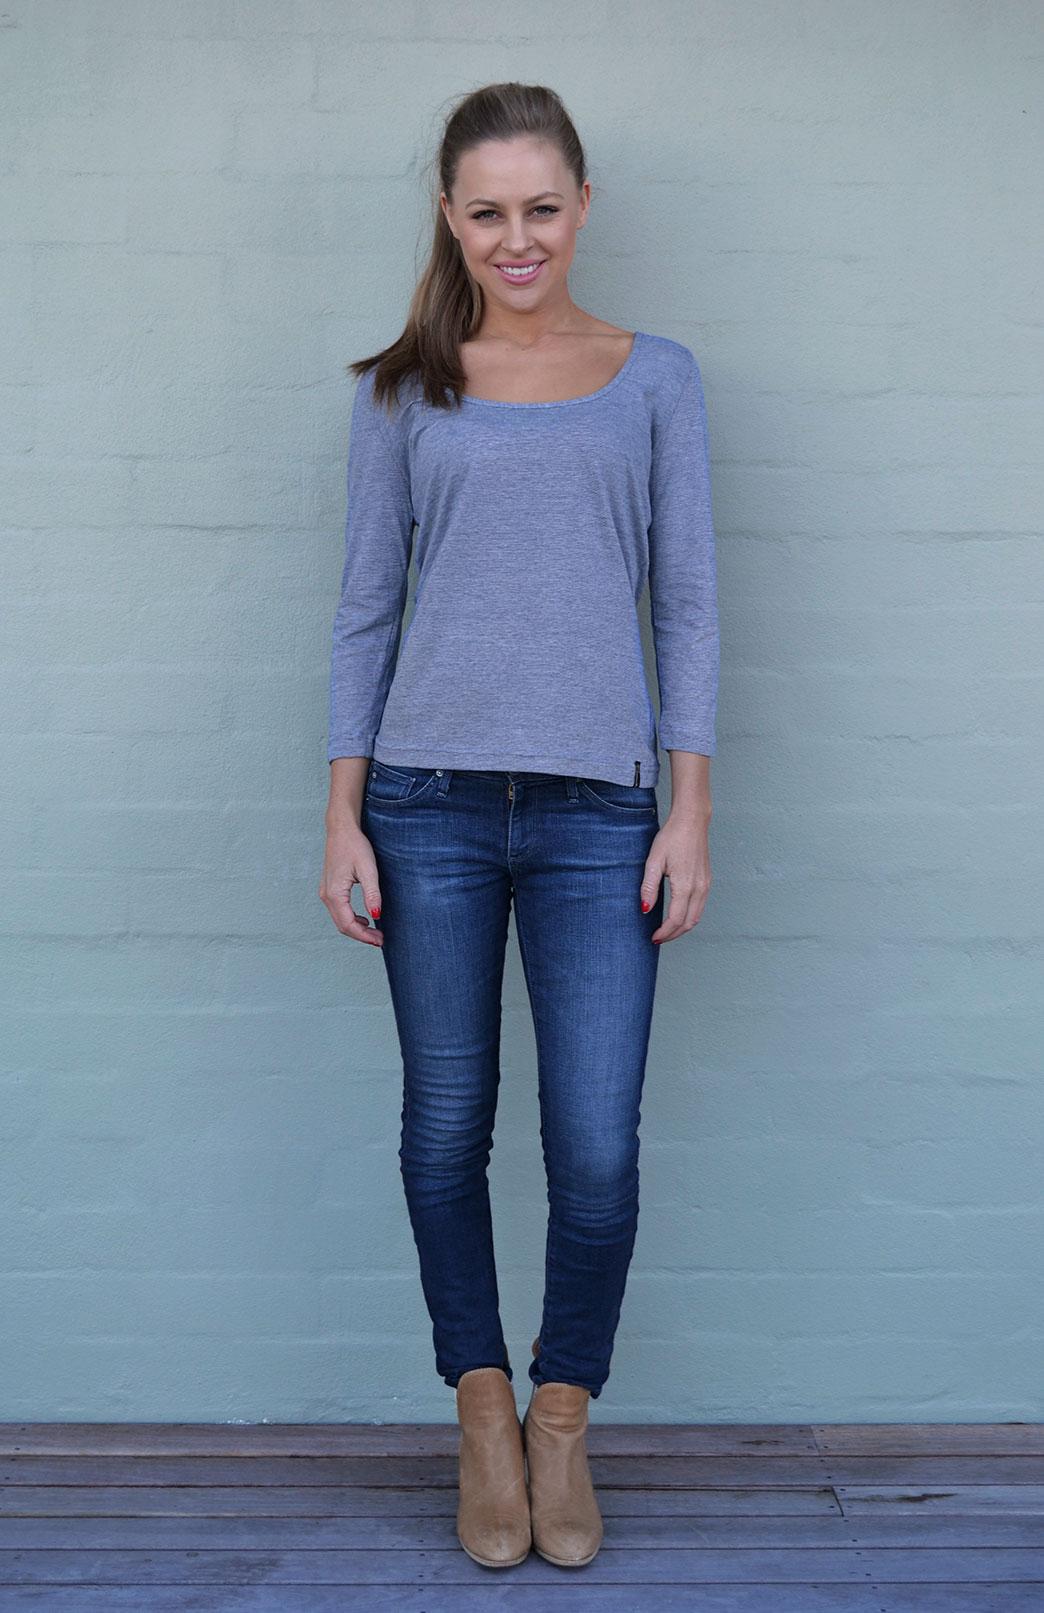 Super Scoop Top - Merino Wool & Organic Cotton Blend Super Scoop Fashion Layering Top - Smitten Merino Tasmania Australia